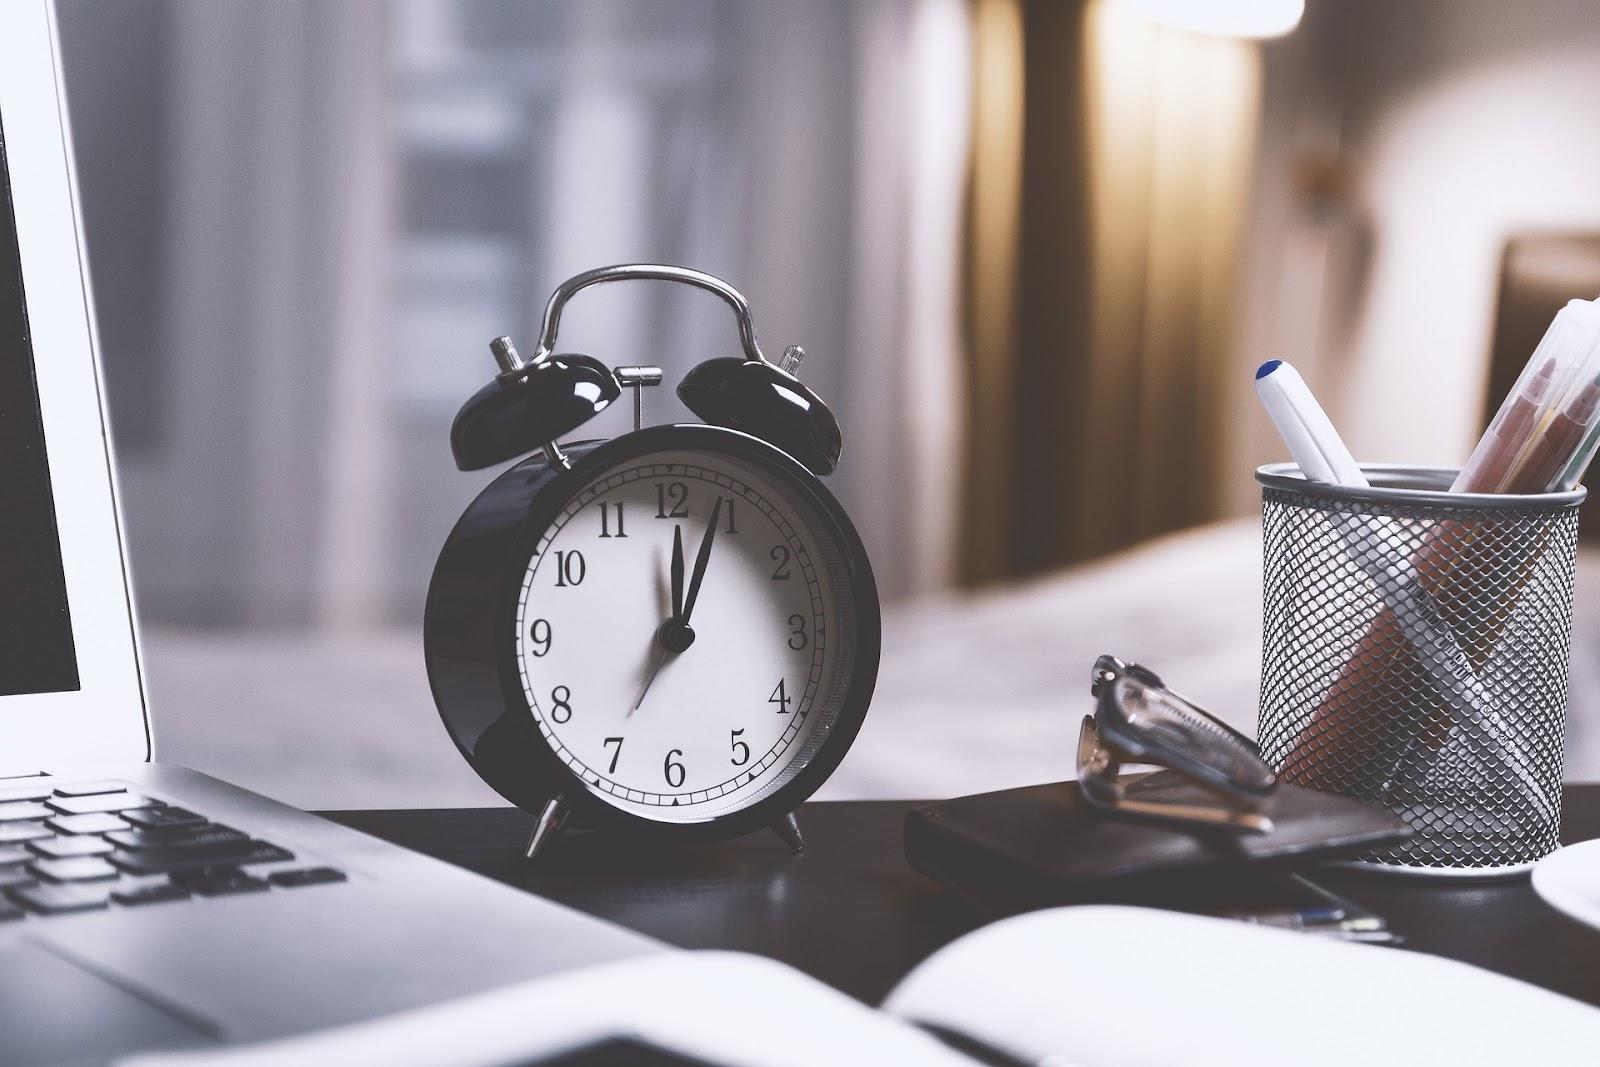 Alarm clock beside laptop for study breaks